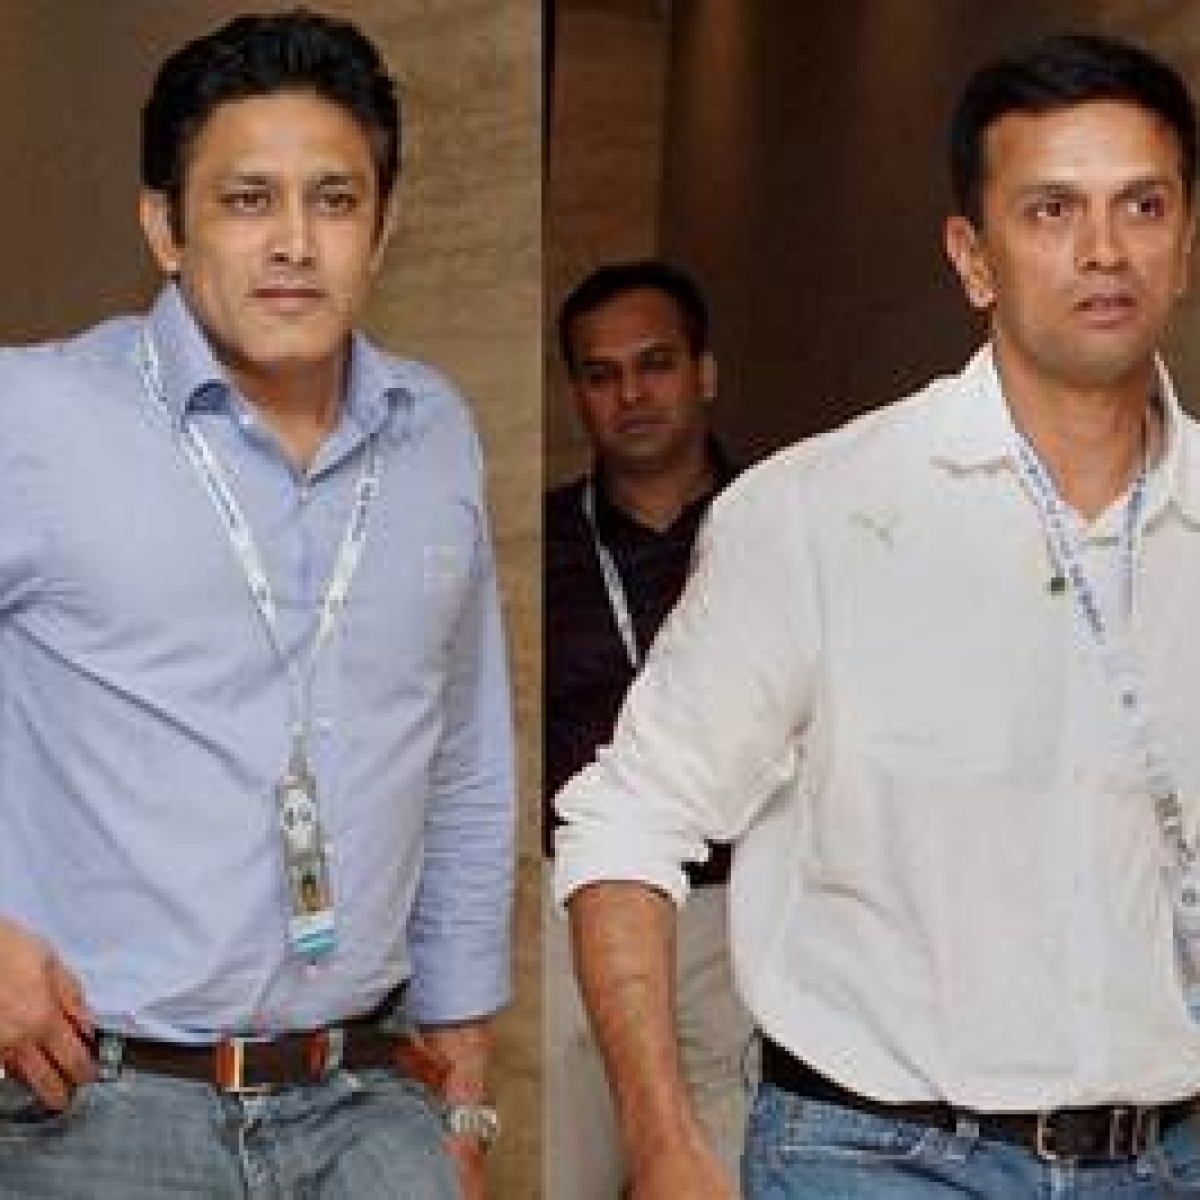 Anil Kumble, Rahul Dravid put forward concerns ahead of Ind-Aus Test series